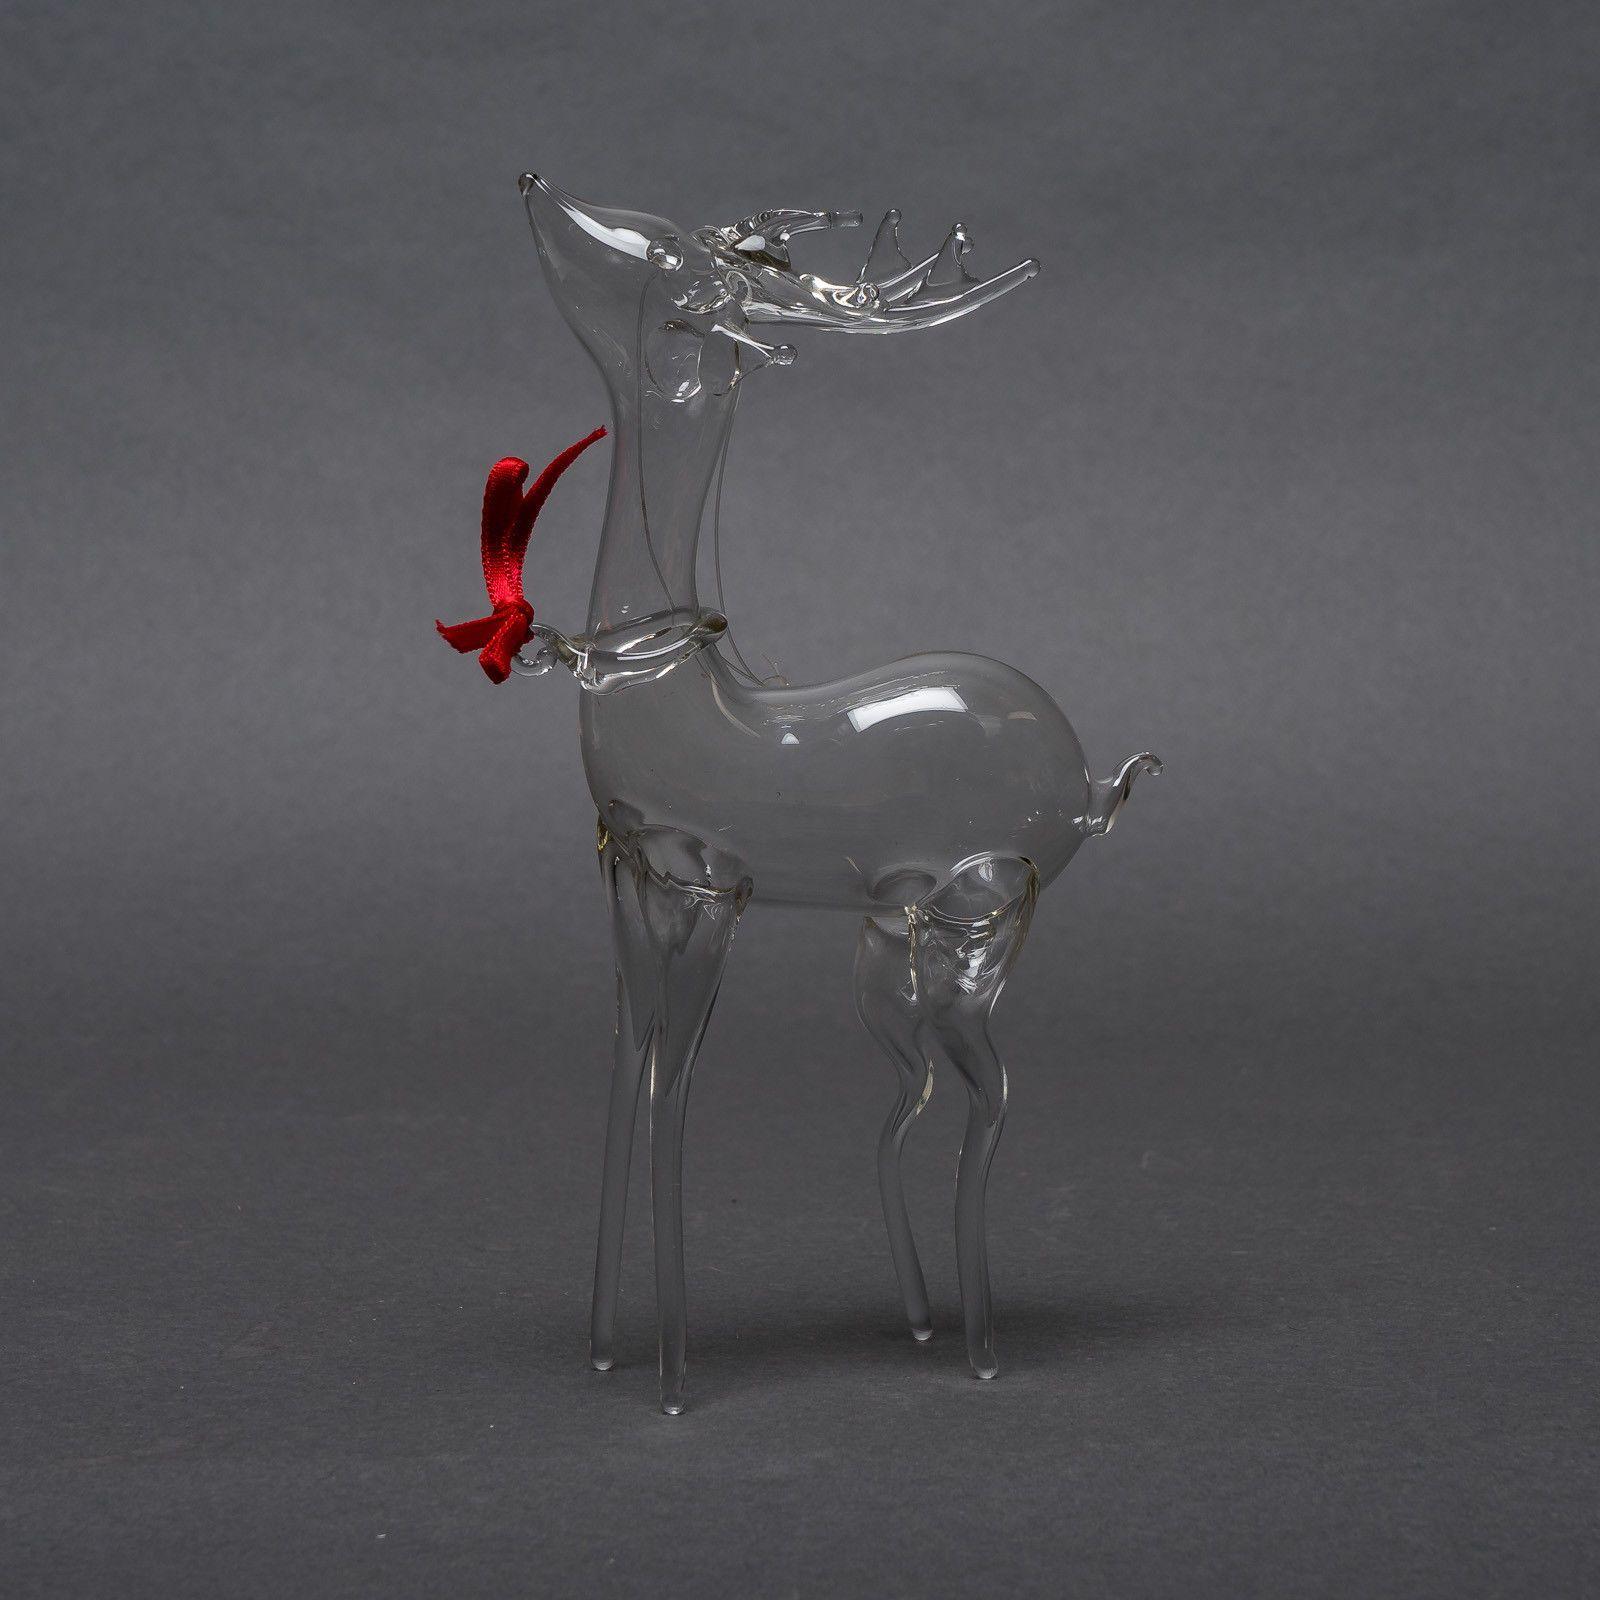 Vintage Hand Blown Clear Art Glass Reindeer Figurine Christmas Ornament Ebay Hand Blown Glass Glass Christmas Tree Ornaments Hand Blown